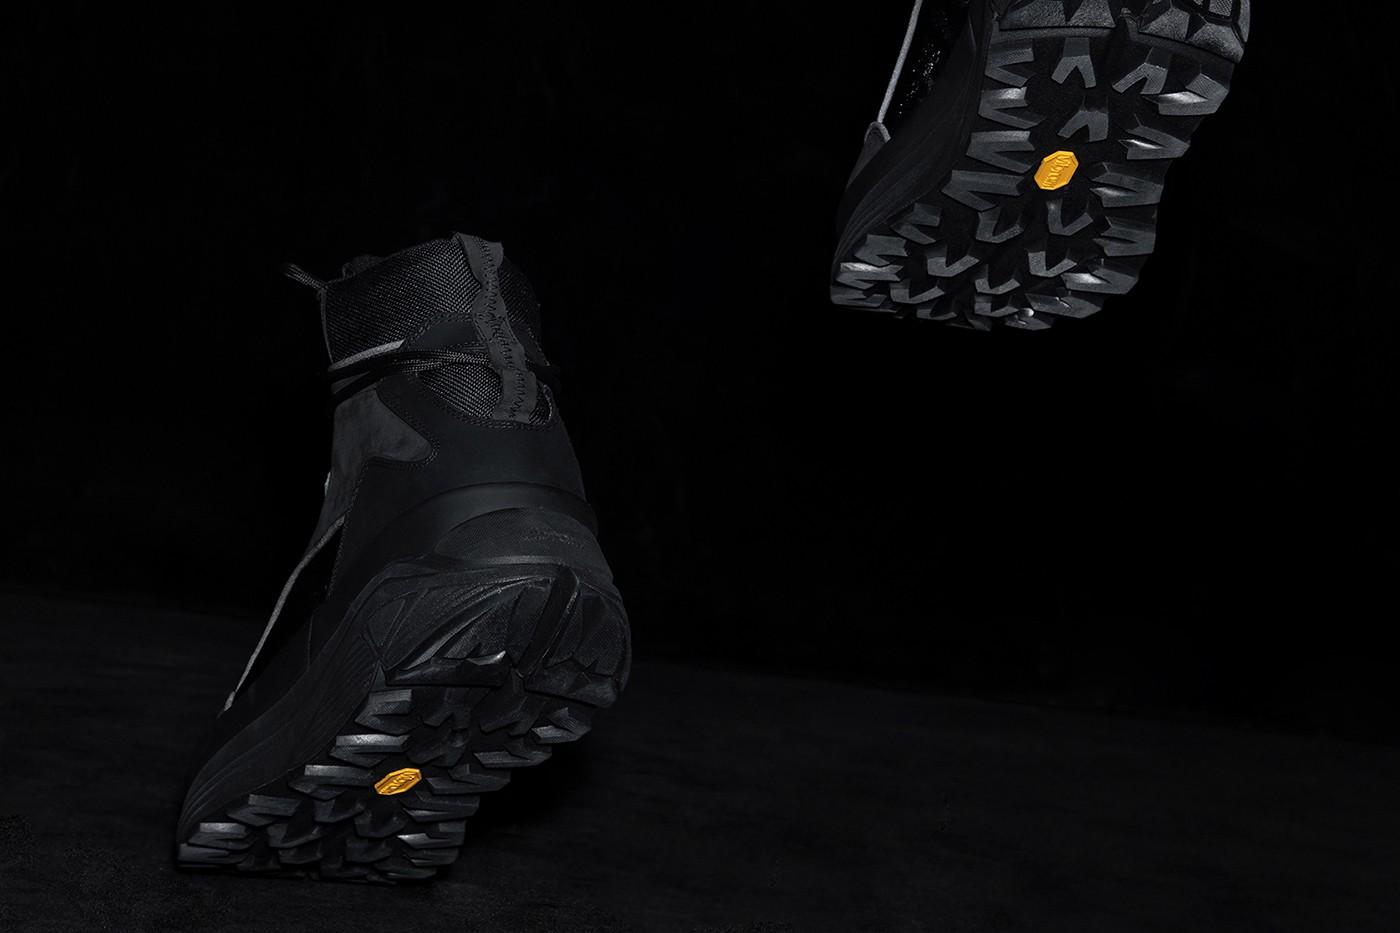 https___hypebeast.com_image_2020_11_c2h4-footwear-atom-alpha-quark-alpha-release-info-009